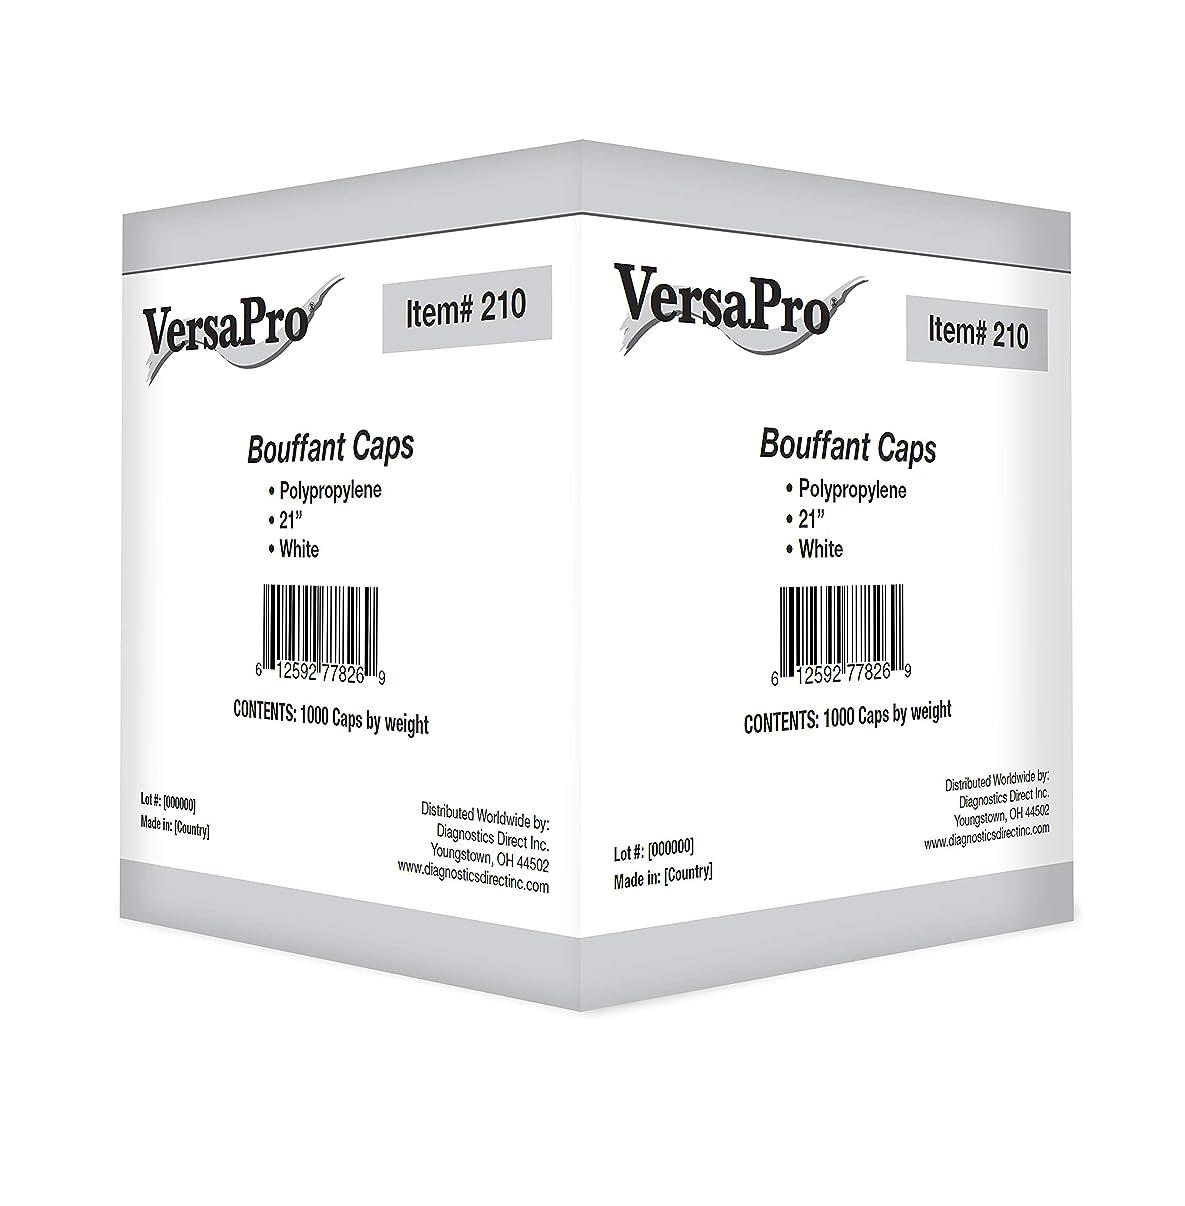 Disposable Hair Net, Spun-Bonded Polypropylene, White, 100 per Bag (Case of 1000)